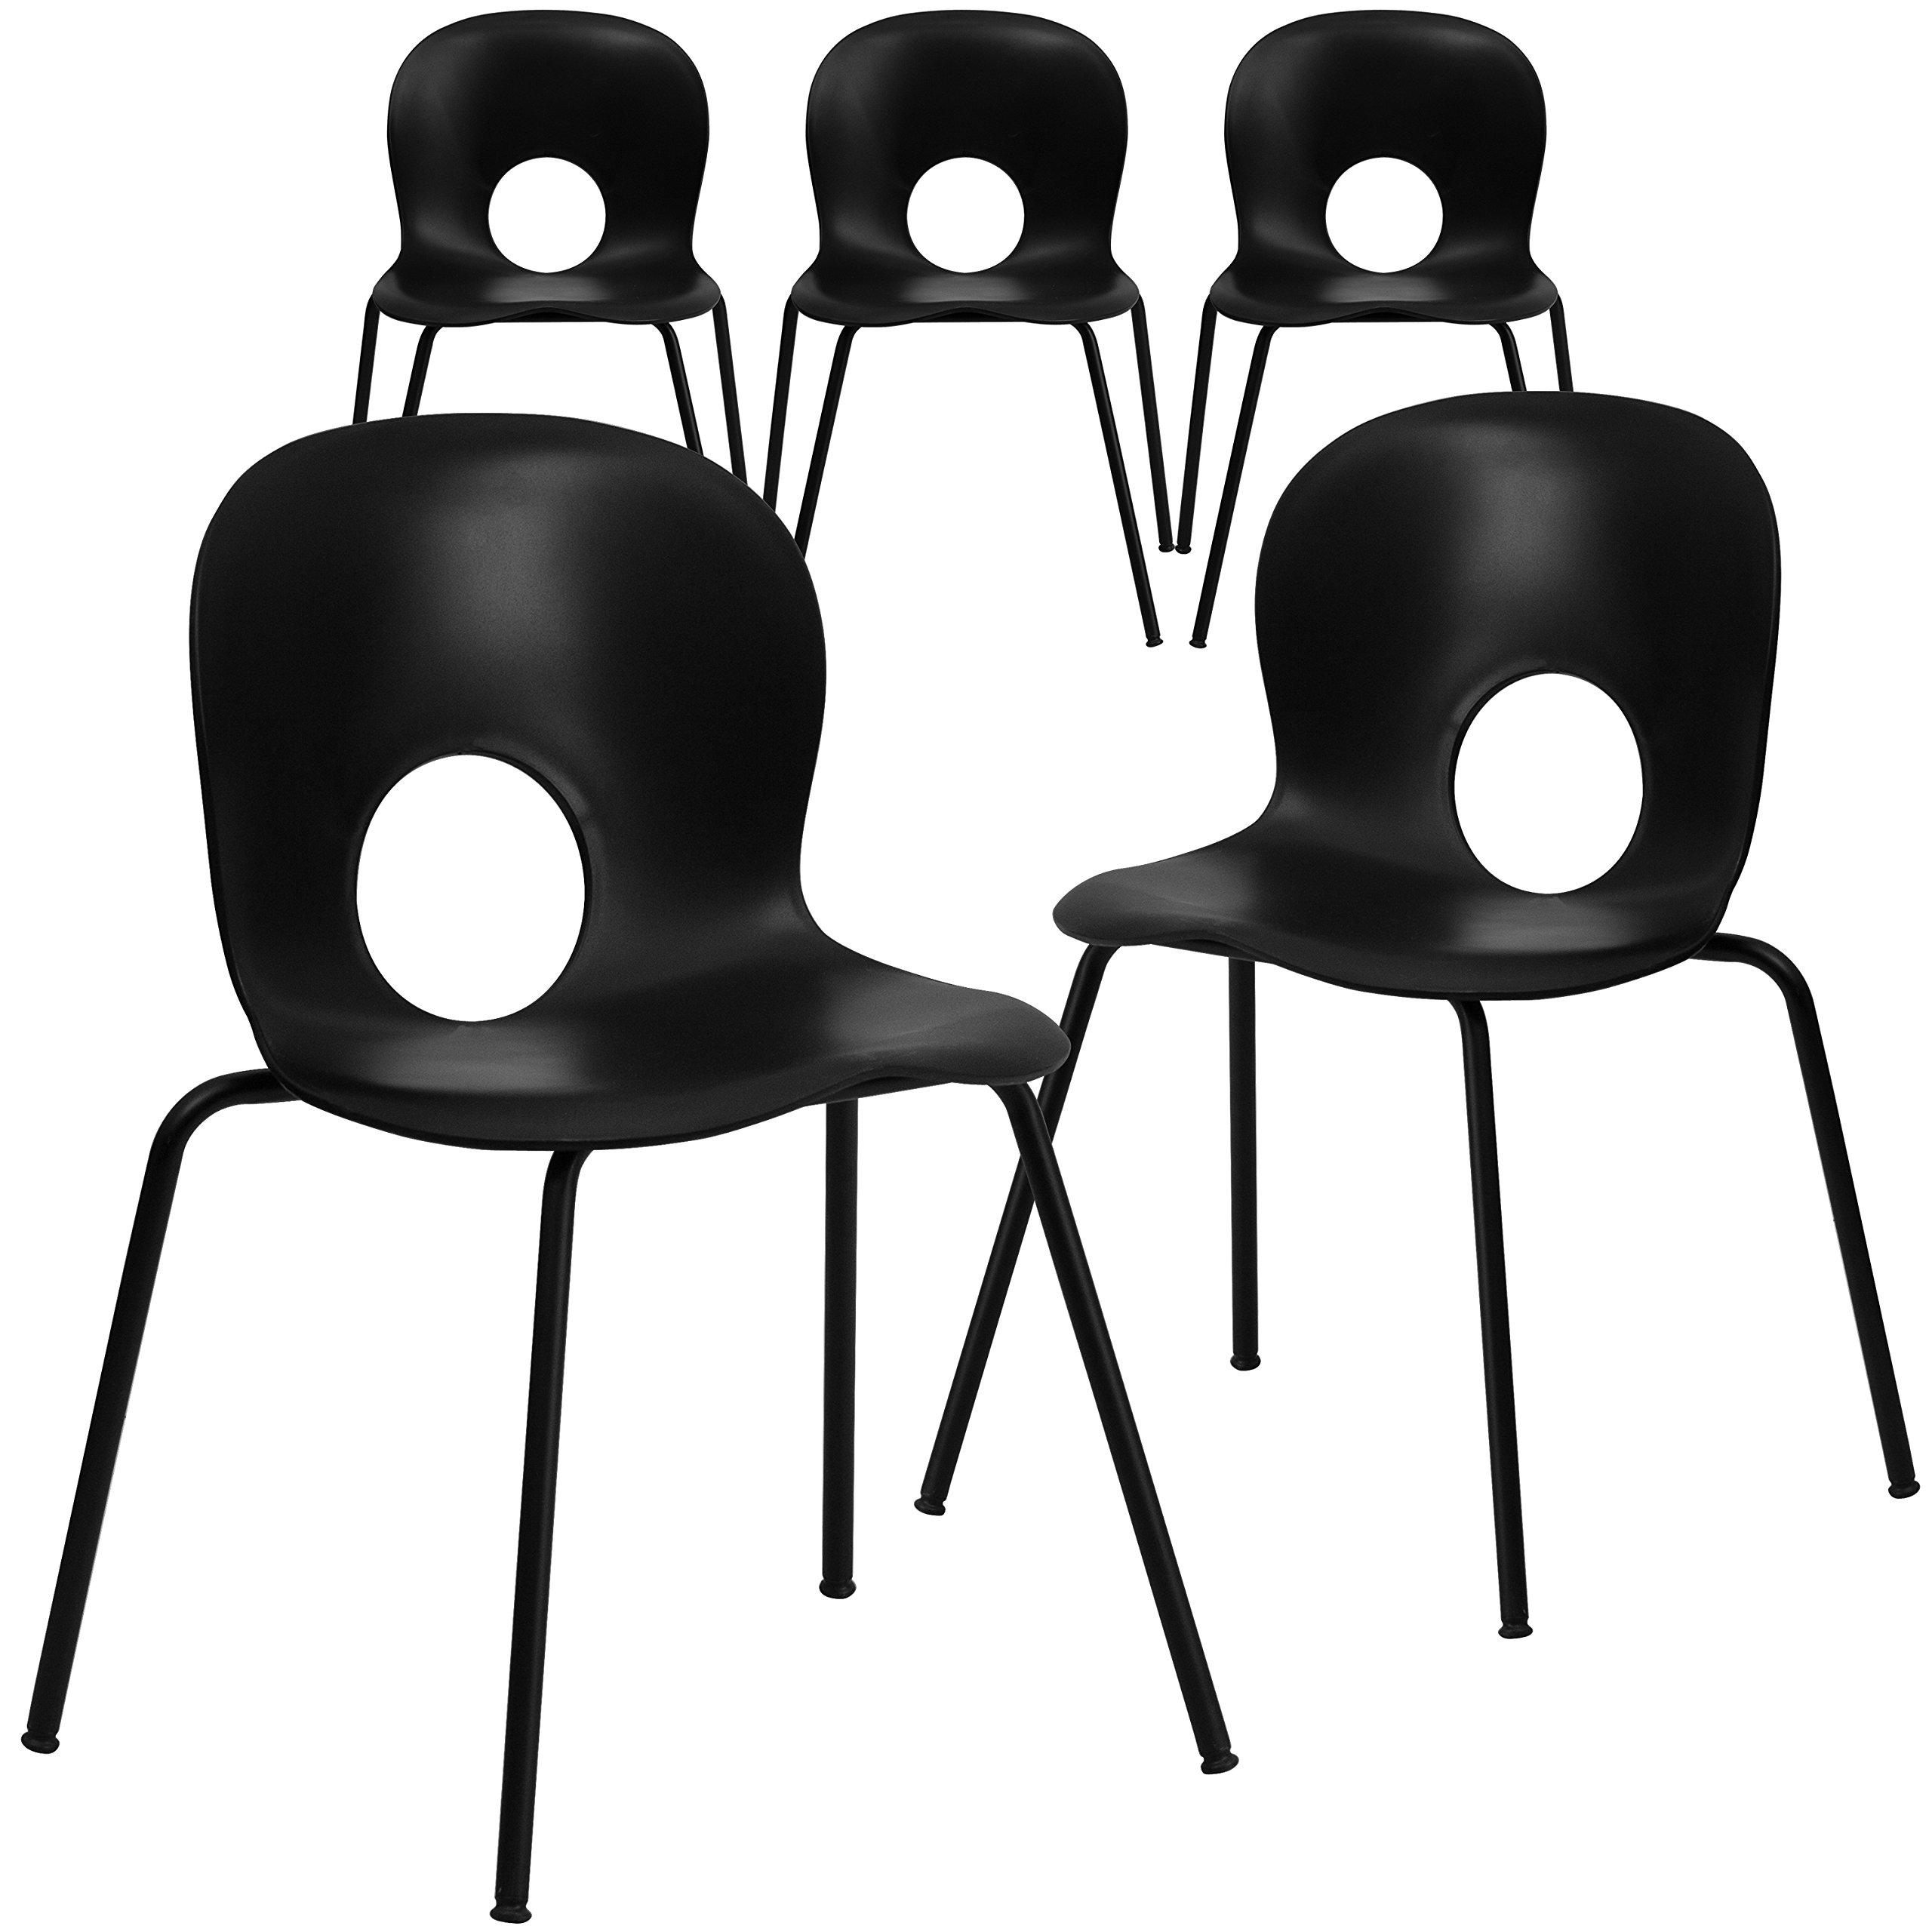 Flash Furniture 5 Pk. HERCULES Series 770 lb. Capacity Designer Black Plastic Stack Chair with Black Frame